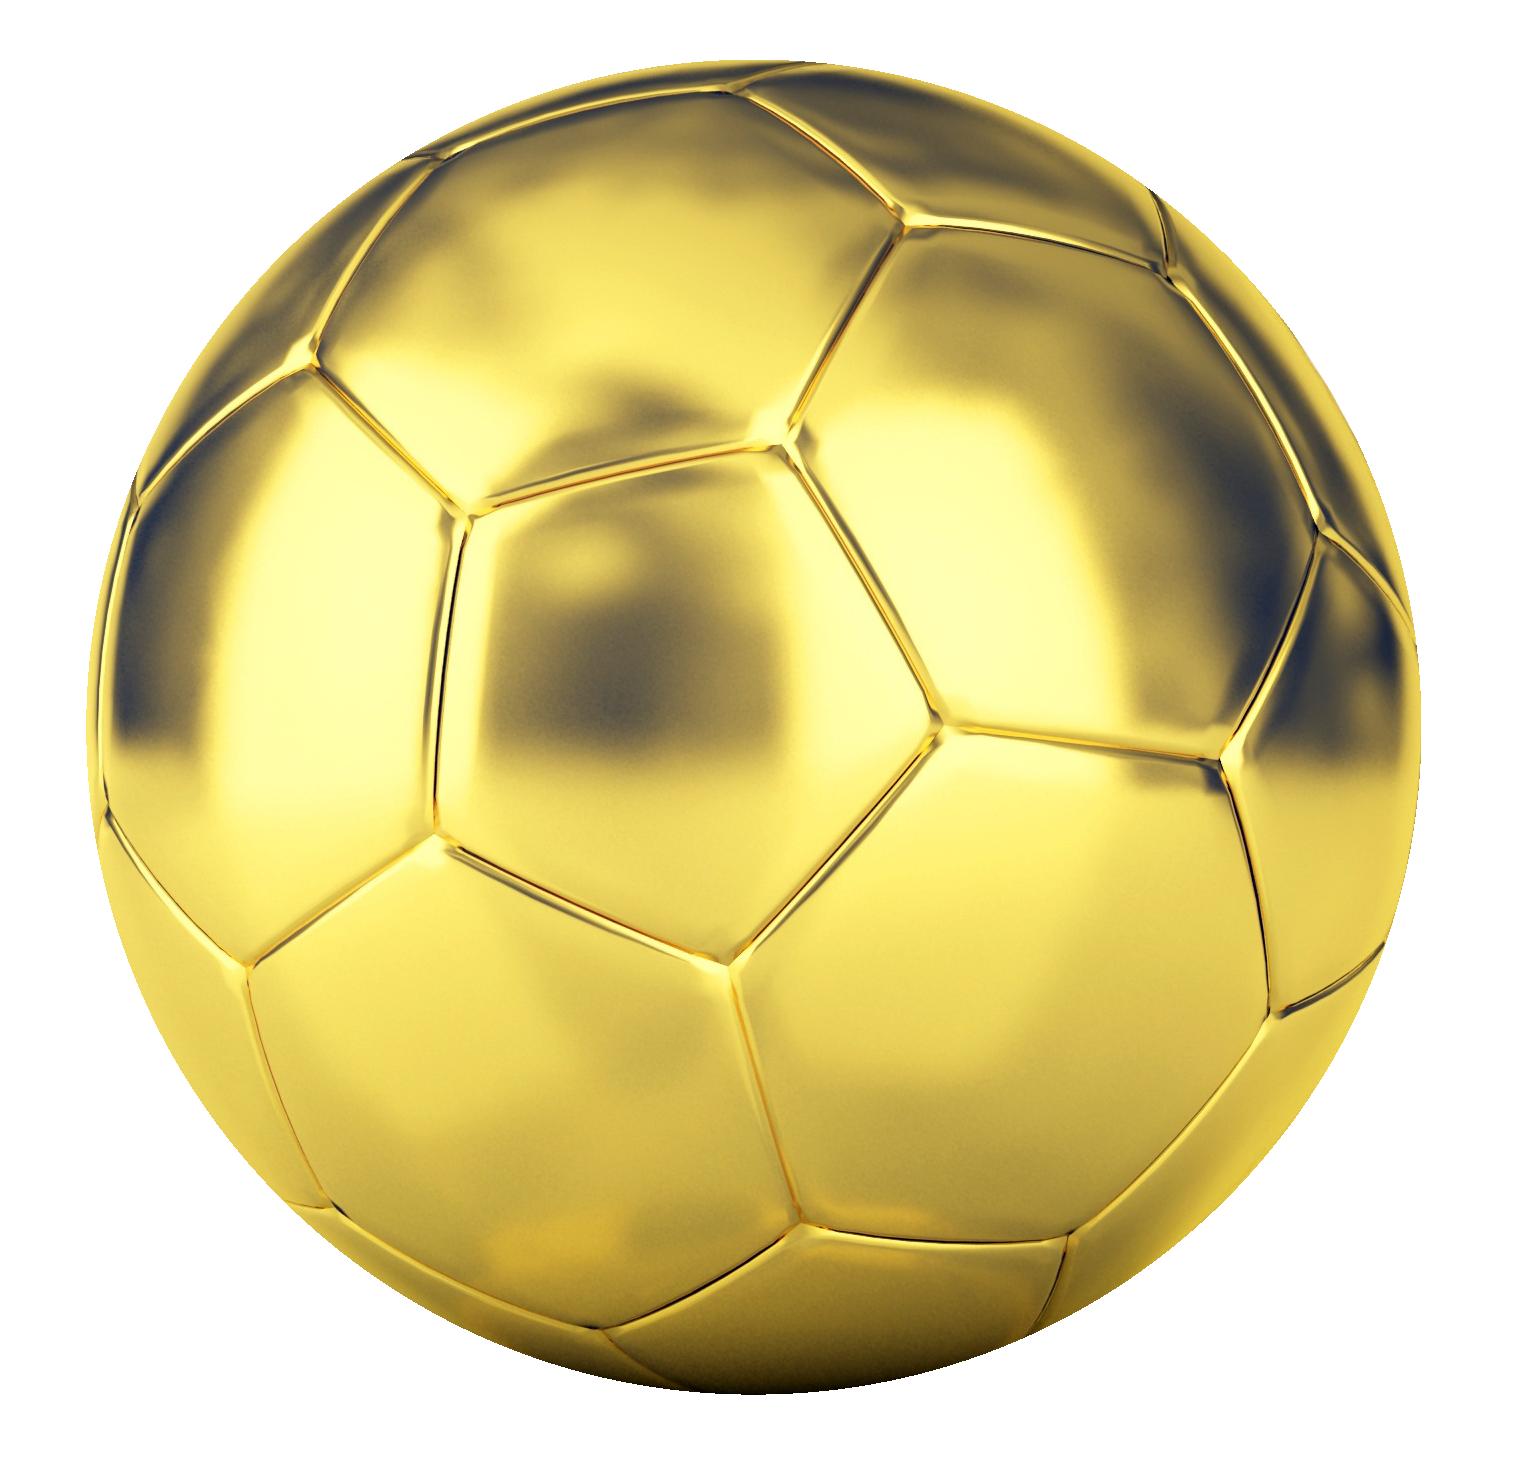 Golden Football Png Transparent Image Soccer Ball Soccer Ball